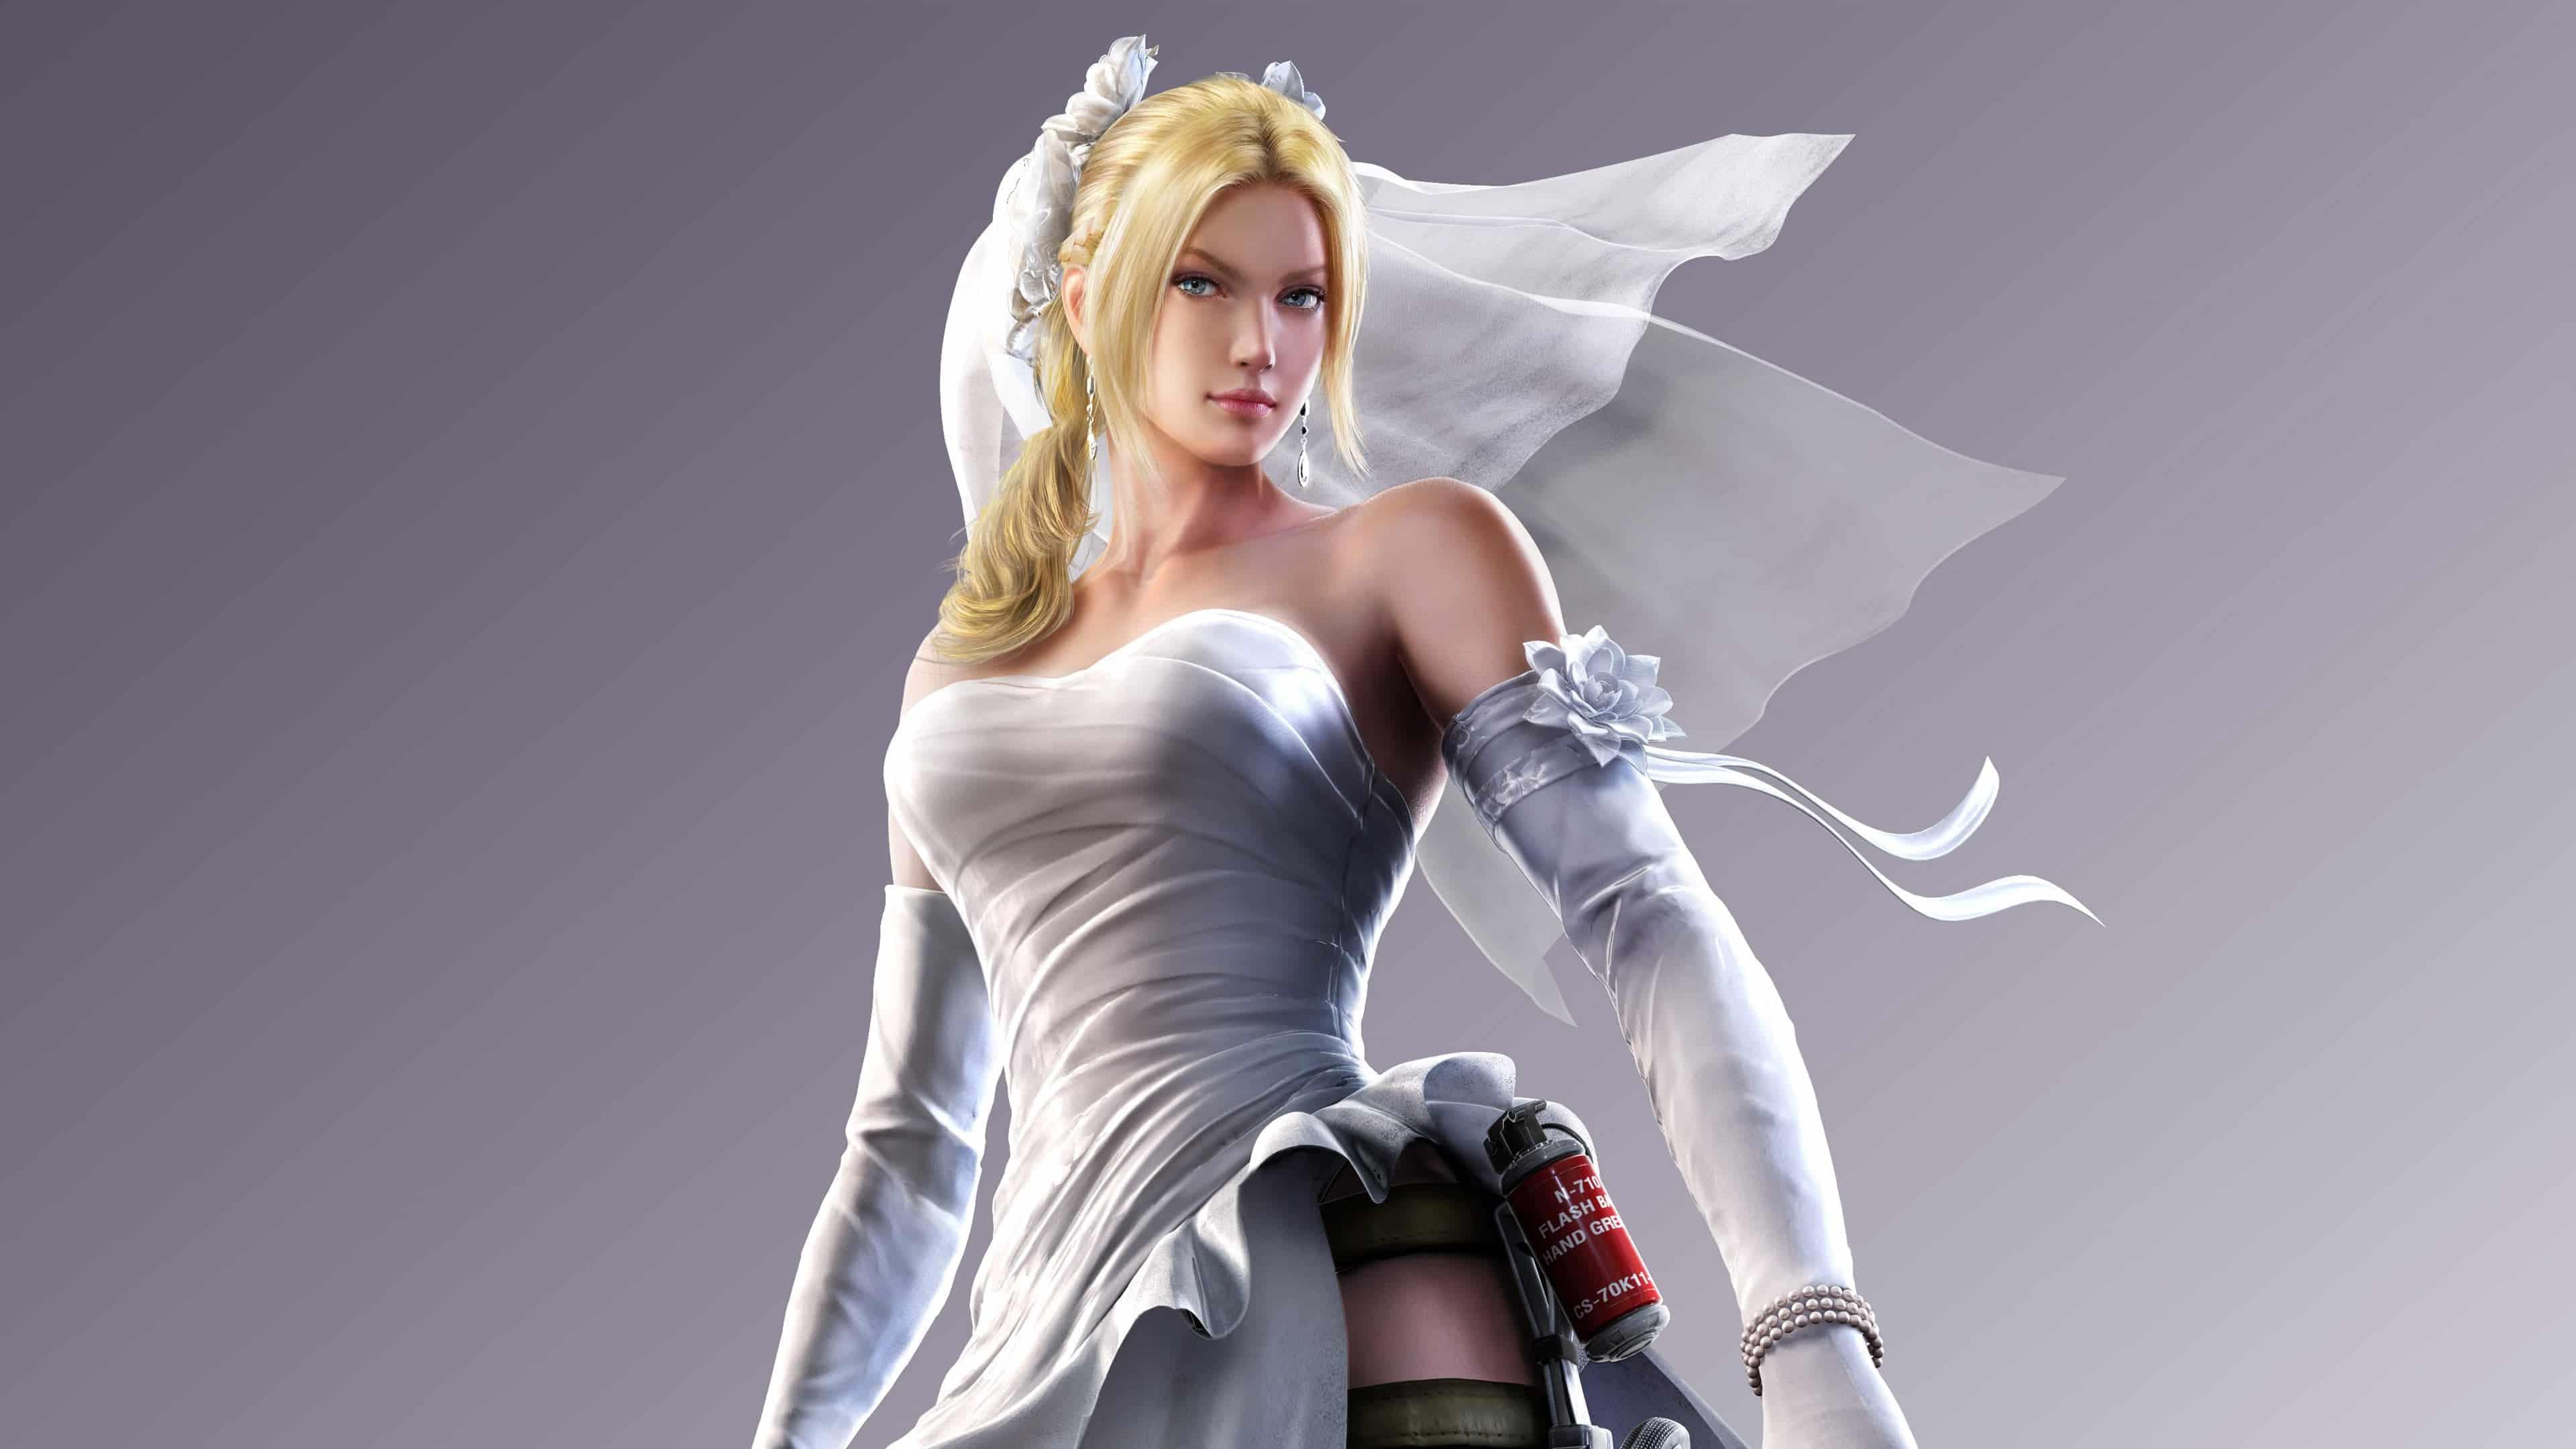 Tekken Nina Williams Wedding Dress Uhd 4k Wallpaper Pixelz